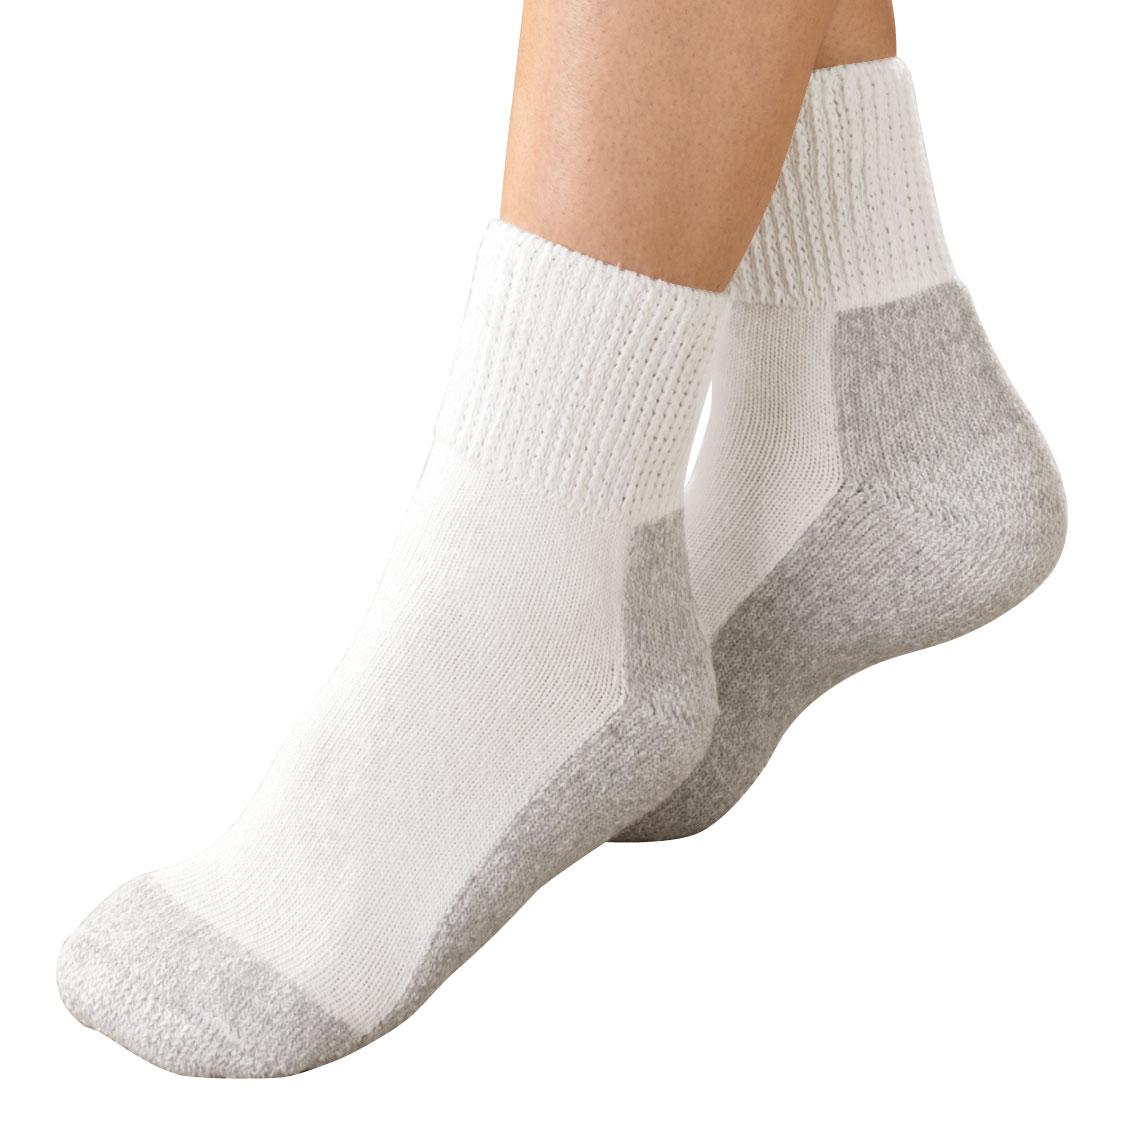 Women's Diabetic Sports Socks - 2 Pairs., One Size Women's diabetic sports socks wick away moisture, won't hinder circulation. Women's diabetic socks for shoe sizes 6-10 1/2. Machine washable. 80% cotton/15% acrylic/5% polyester. 2 pairs of white diabetic socks.